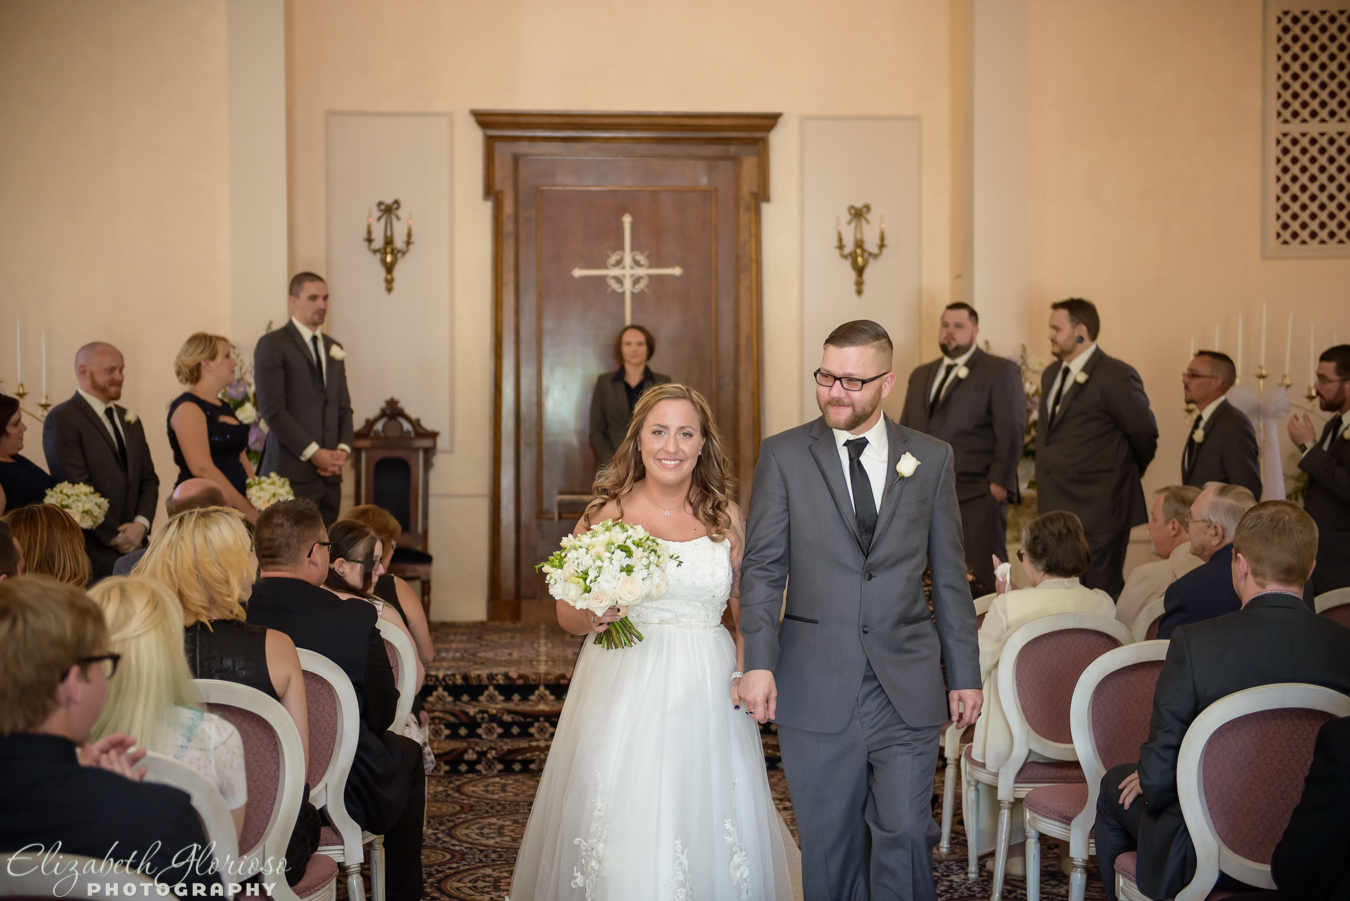 Zakovec_Wedding_Glorioso_Photography_Cleveland-122